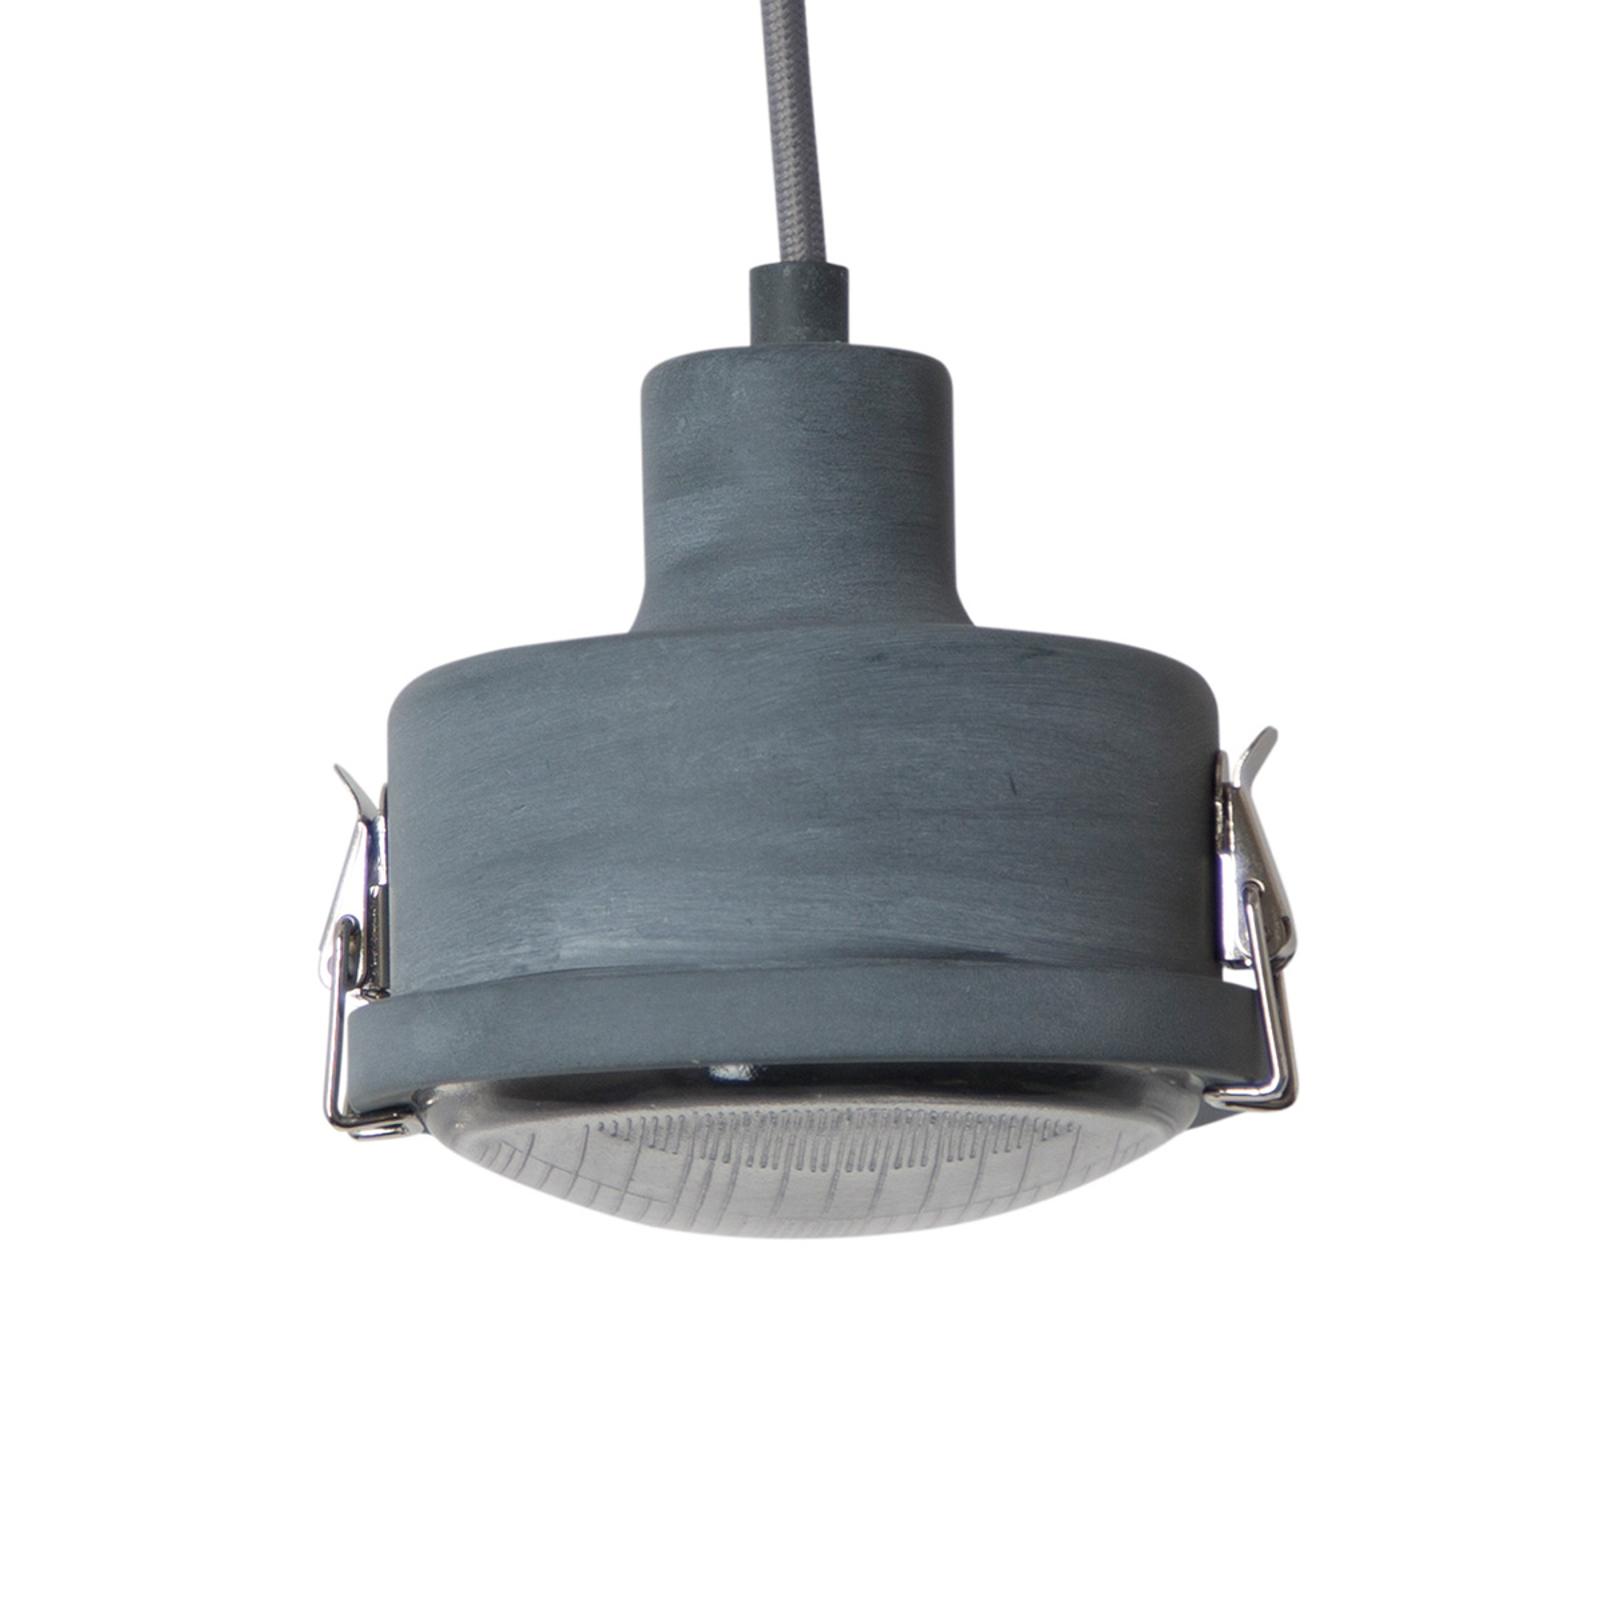 Moderne hanglamp Satellite in grijs